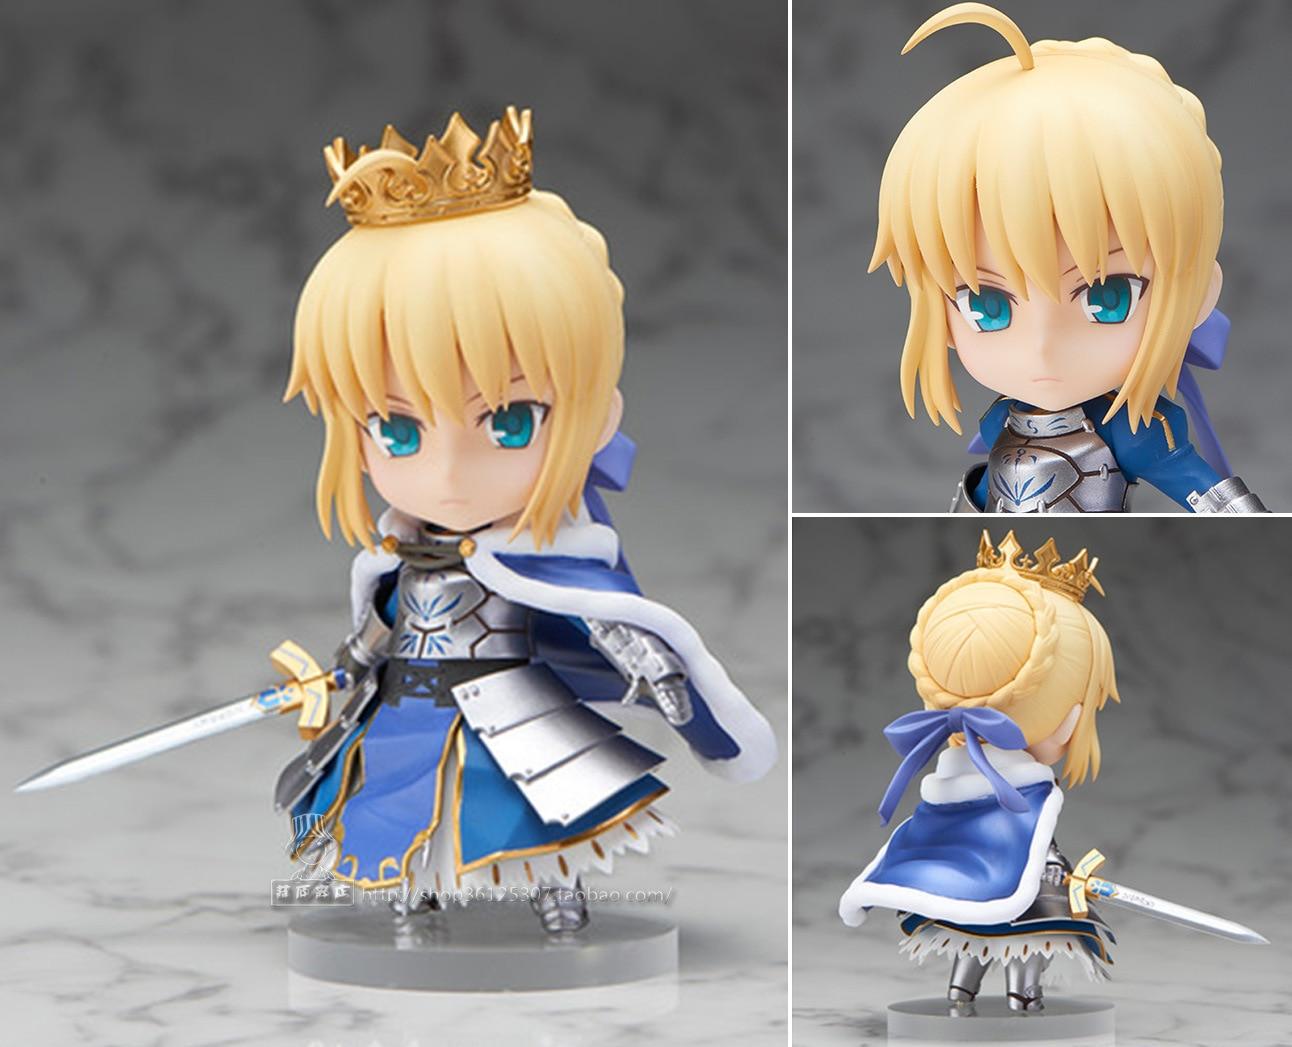 Nendoroid Fate Grand Order Saber/Altria Pendragon #600 PVC Figure Collection Model Toy 10cm KT3301 le fate топ